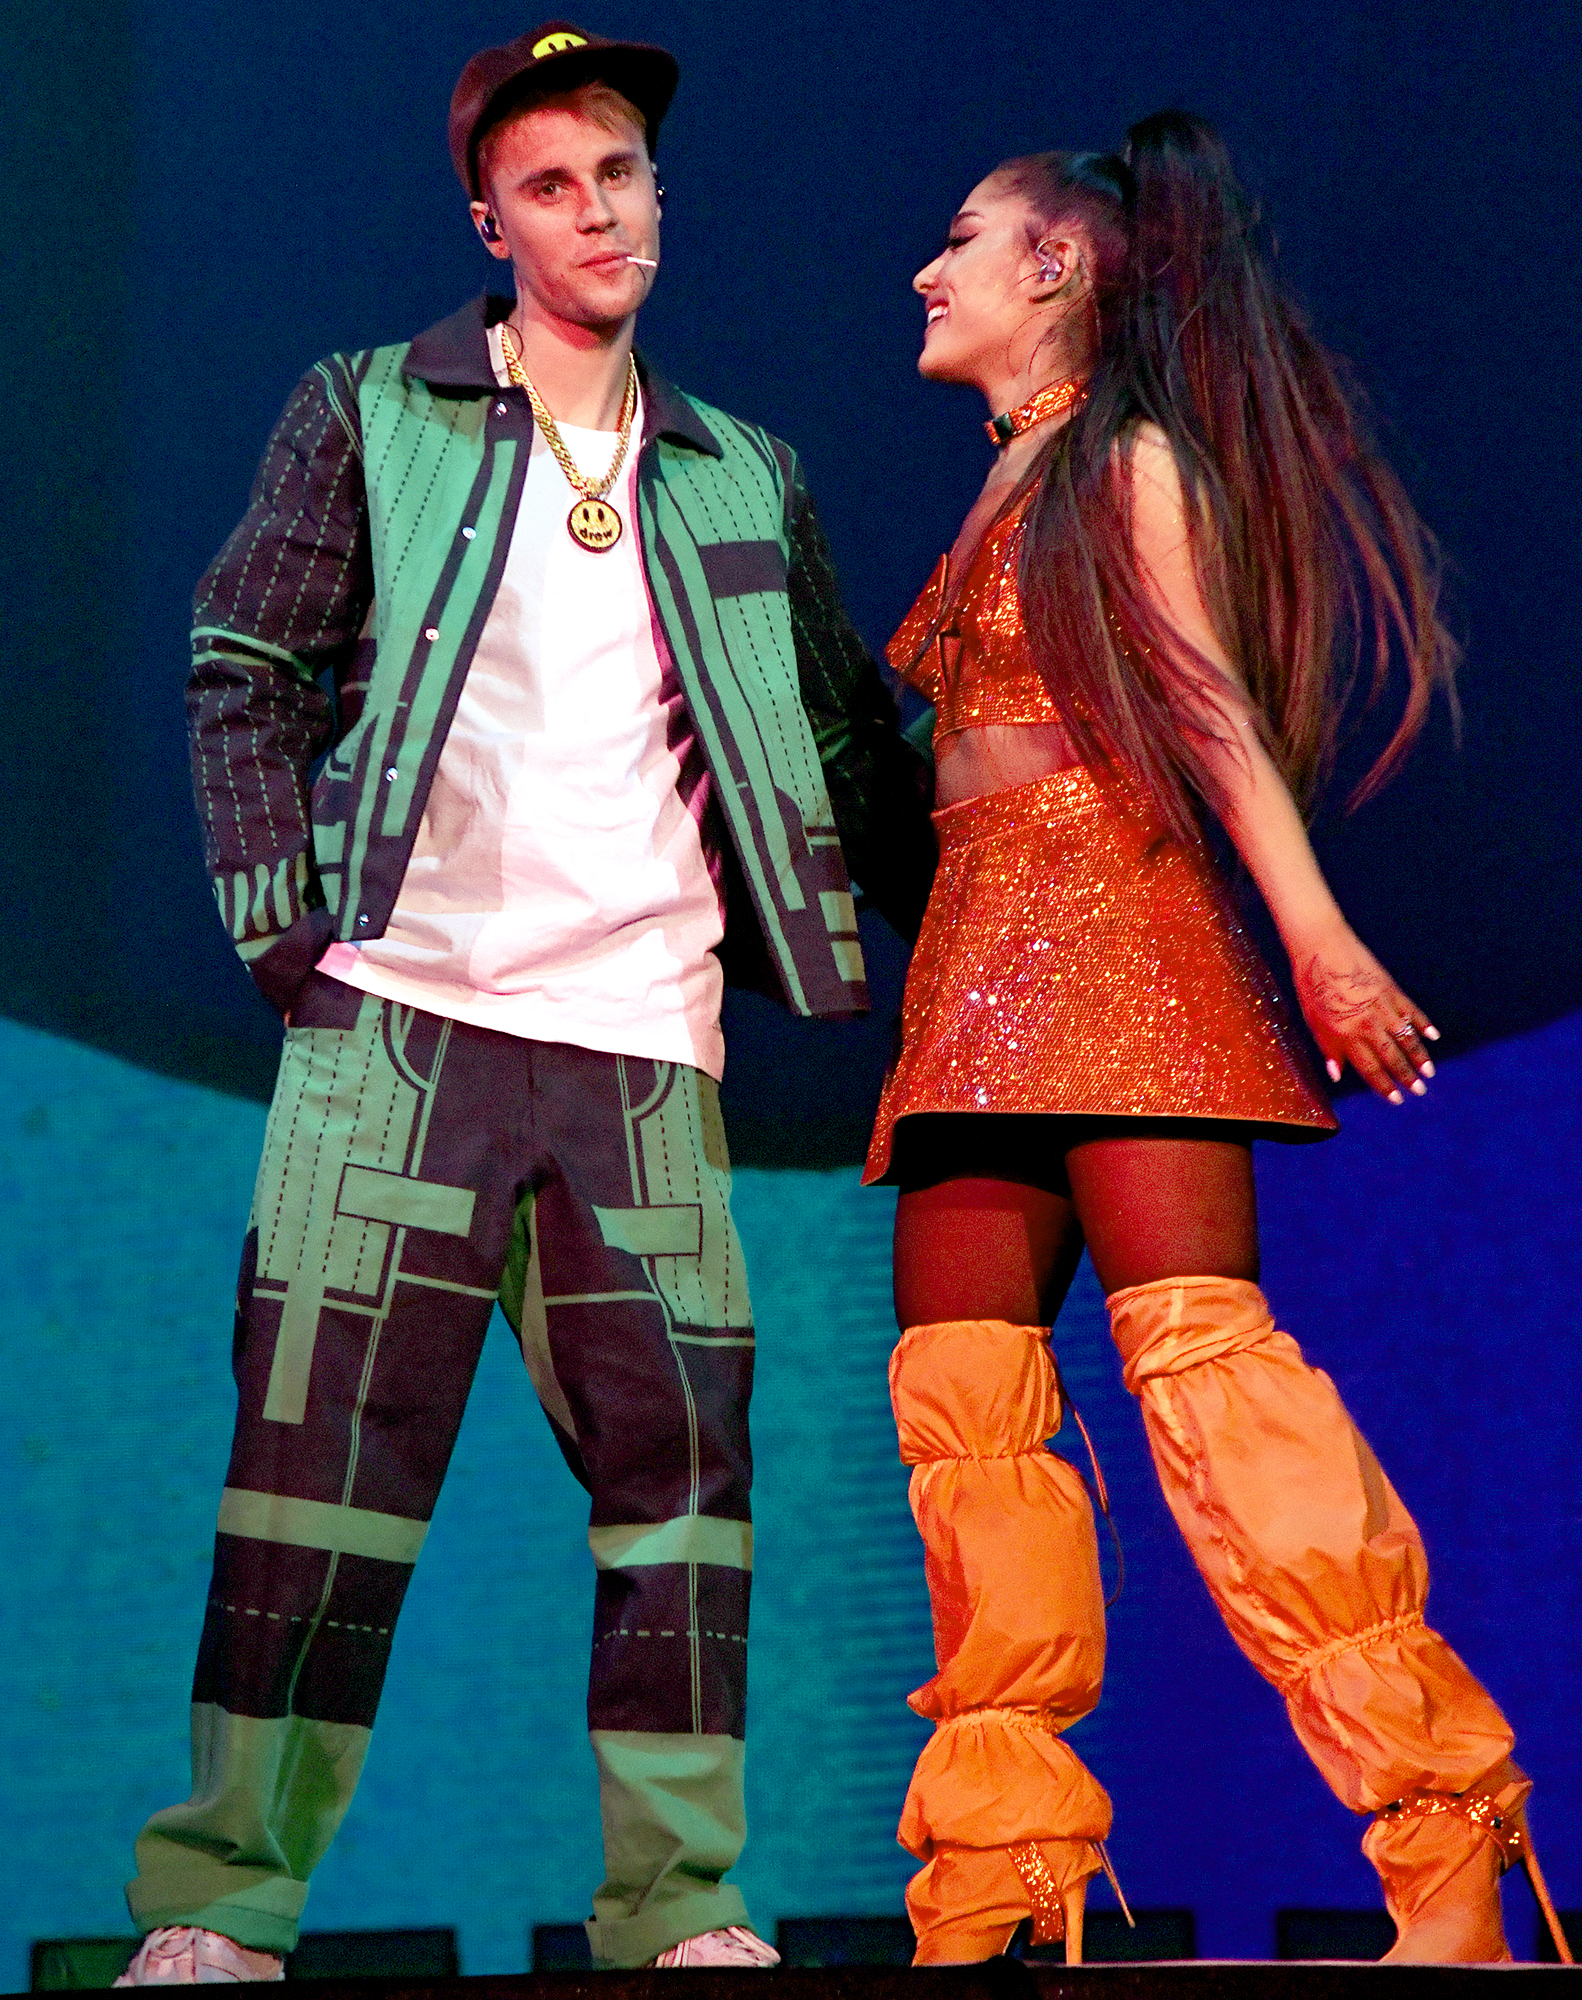 Justin-Bieber-Ariana-Grande-Coachella